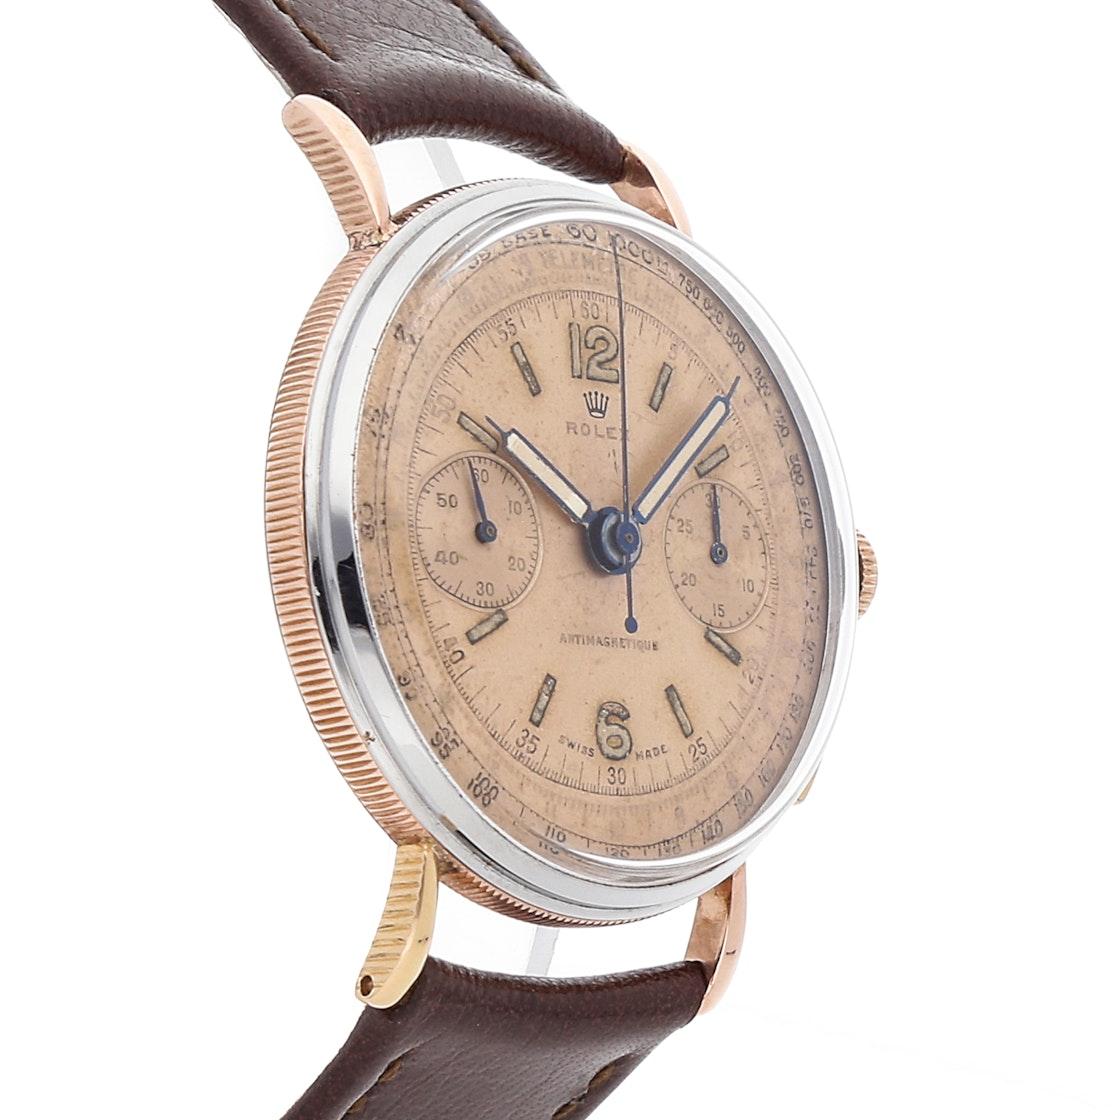 Rolex 1940's Chronograph 4062